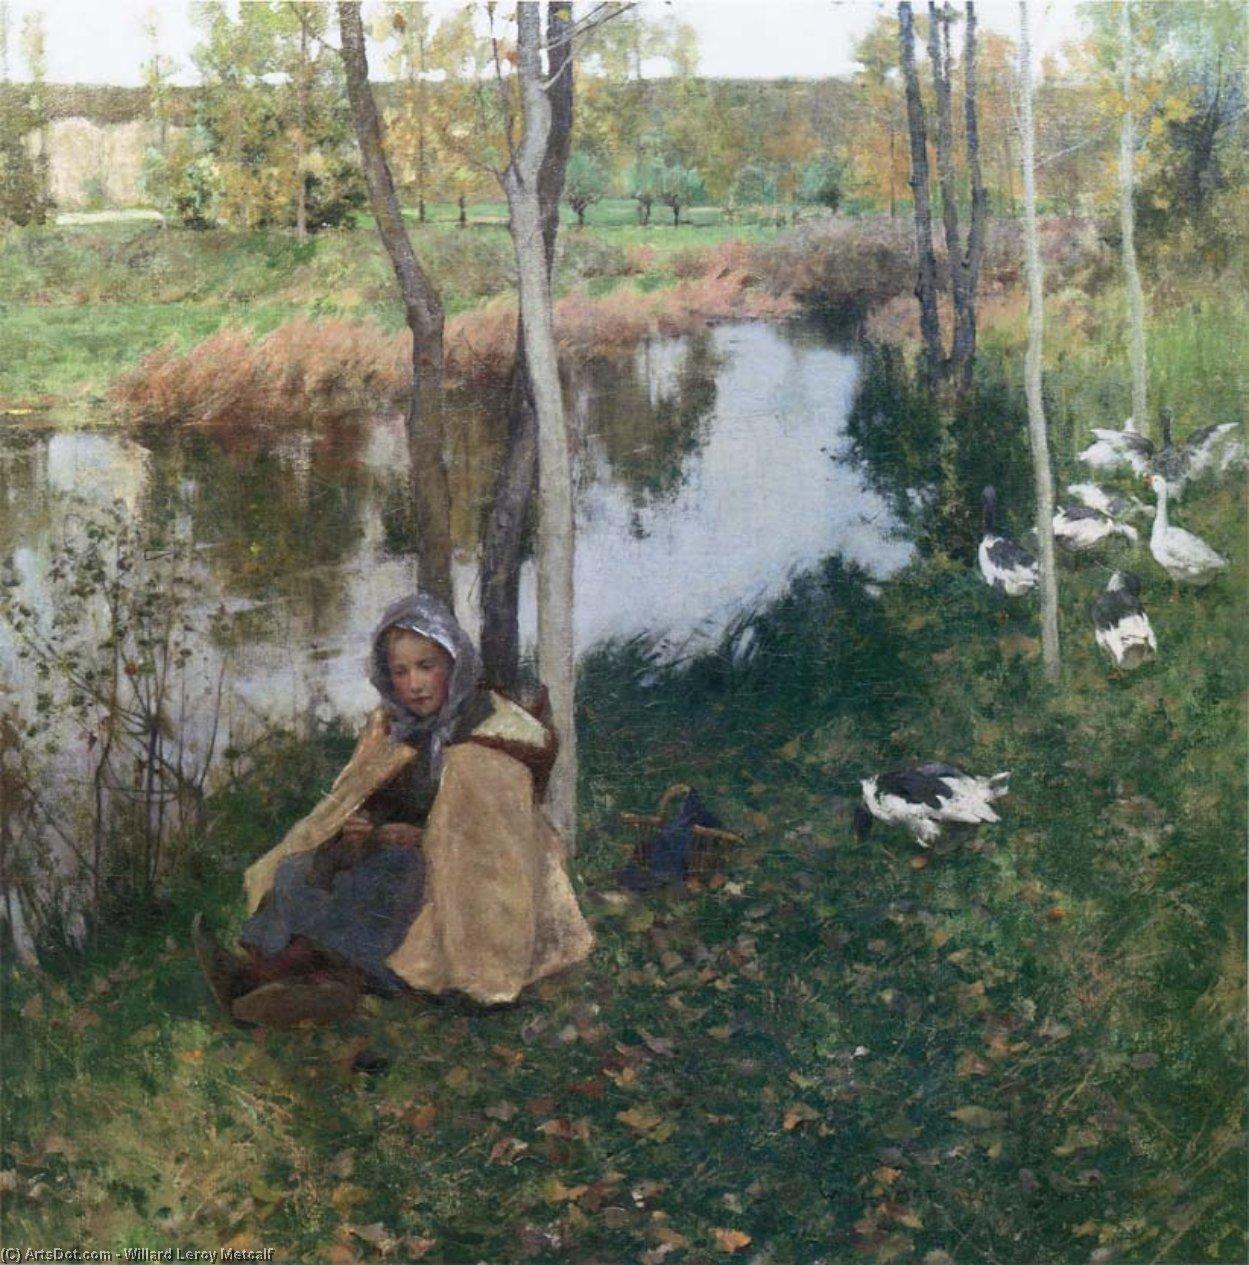 Wikioo.org - The Encyclopedia of Fine Arts - Painting, Artwork by Willard Leroy Metcalf - Goose Girl